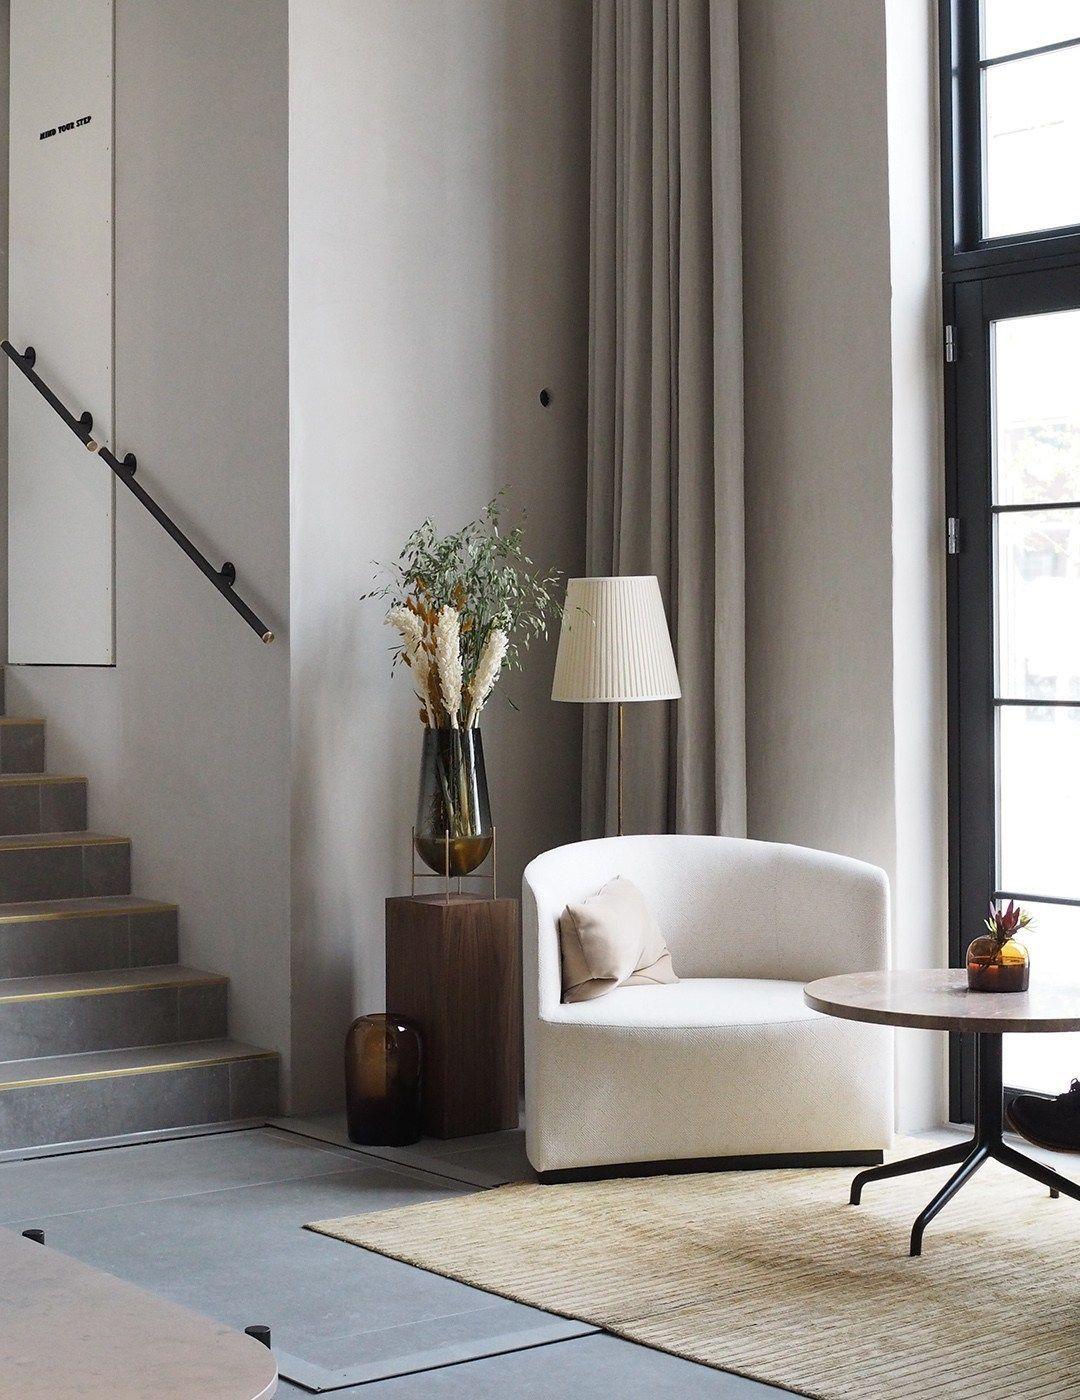 The Audo Hotel In Copenhagen By Menu And Norm Architects Design Hotel Copenhagen Danish Design Minimalist Design Norm Architects Hotels Design Interior